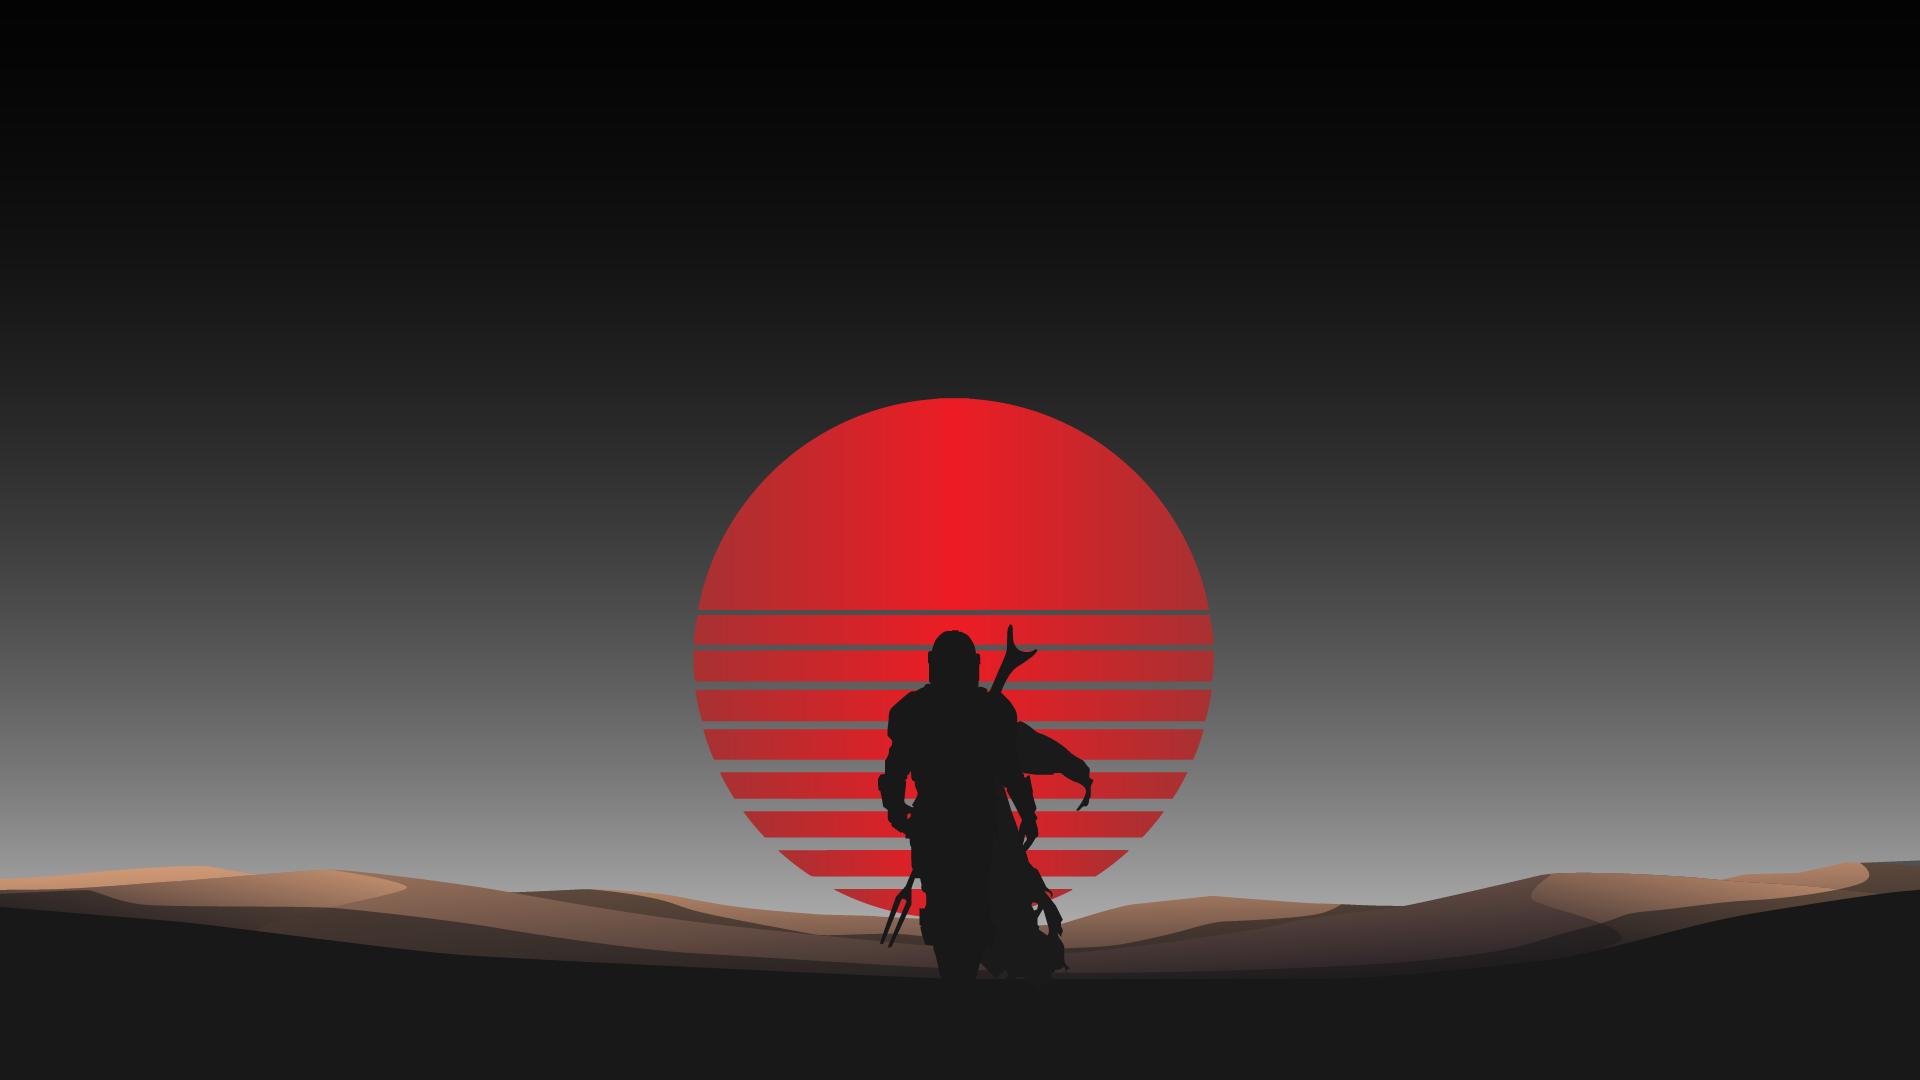 the mandalorian synth wave style sun wallpaper 4k for laptop macbook mac chromebook